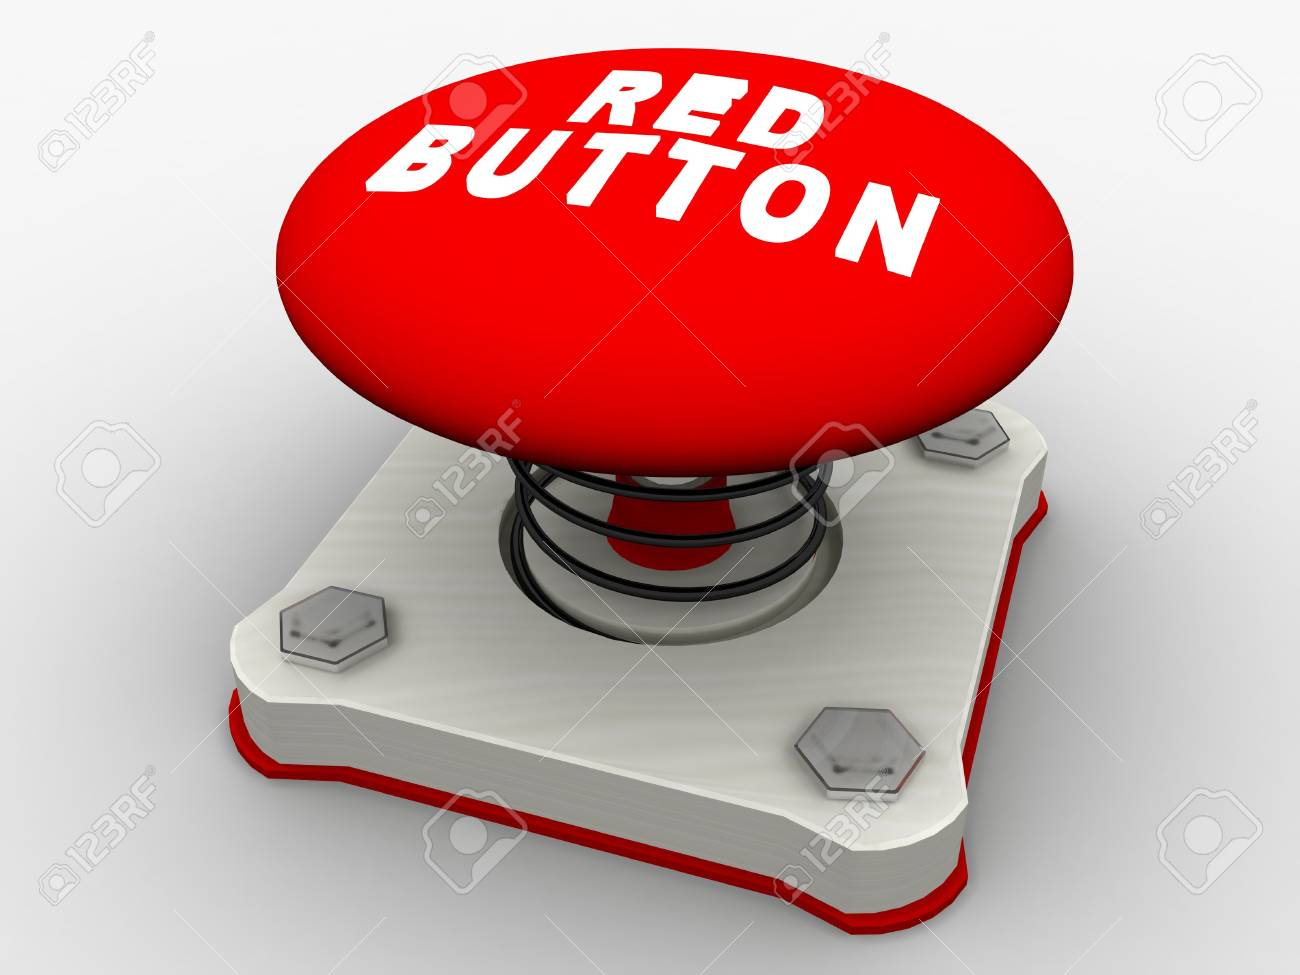 Green start button on a metal platform Stock Photo - 5338609